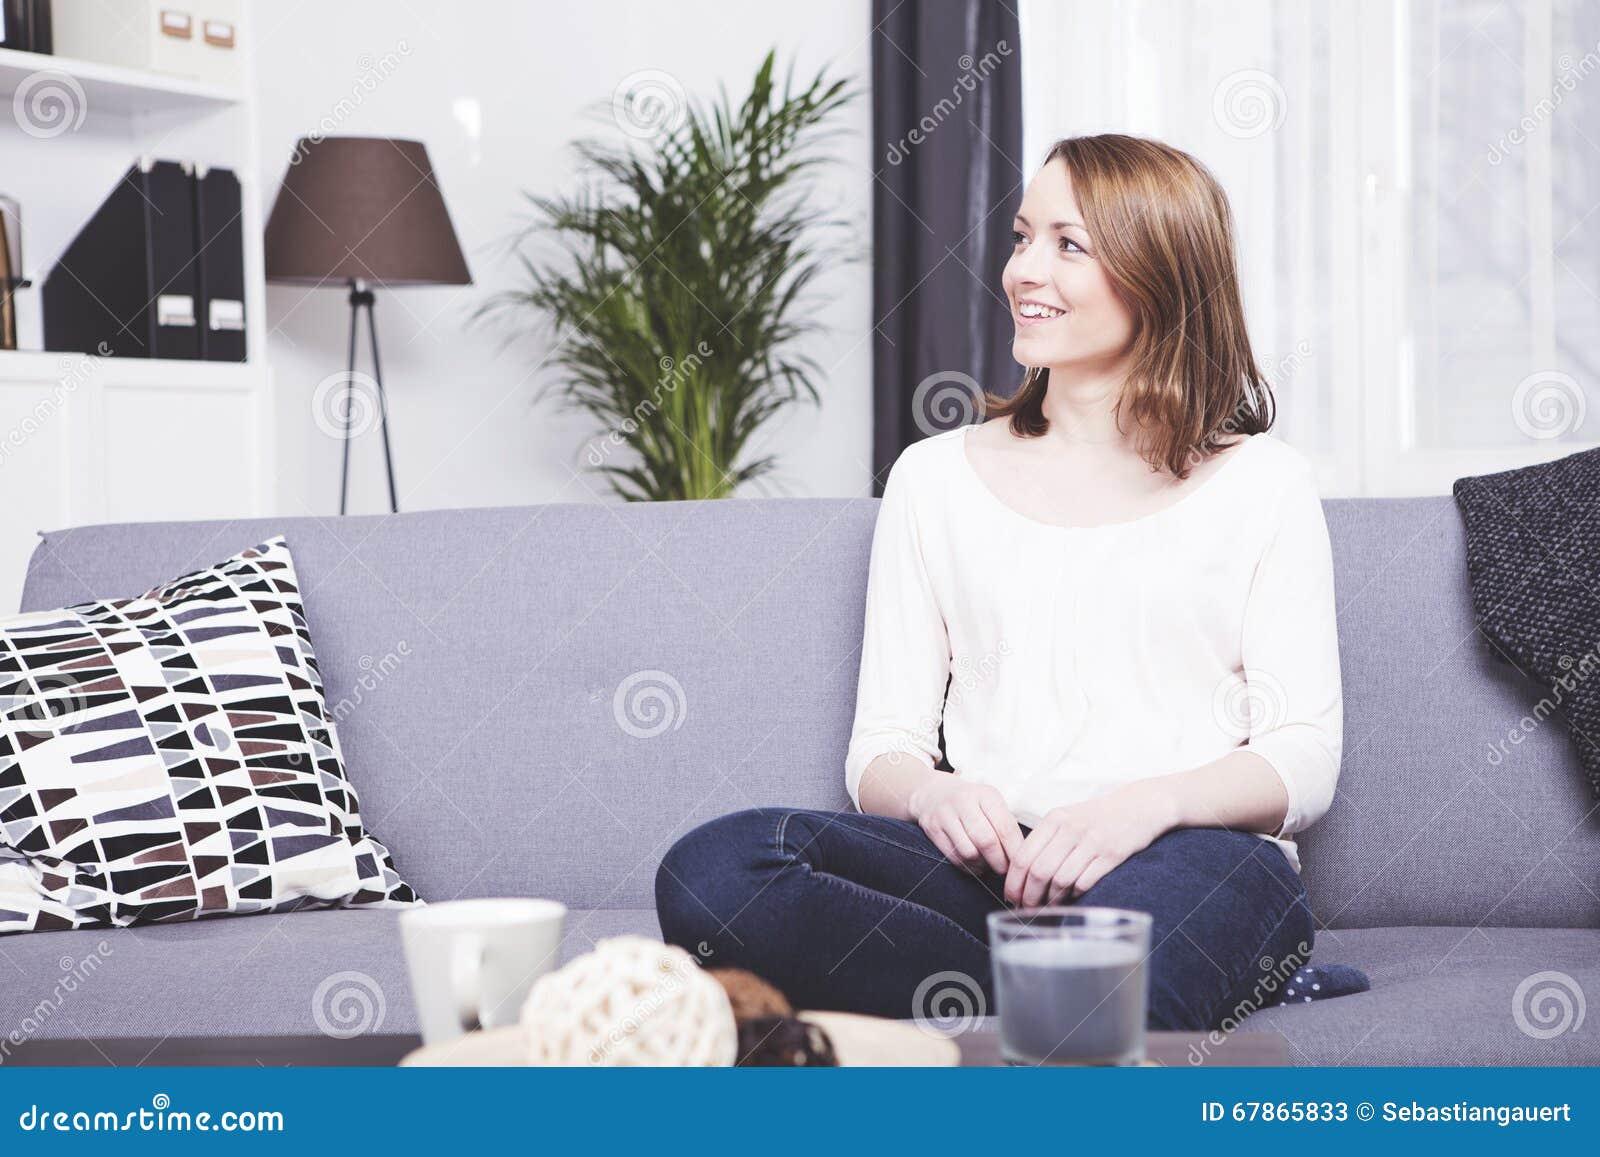 Gelukkige bruine haired meisjeszitting die op een bank glimlachen